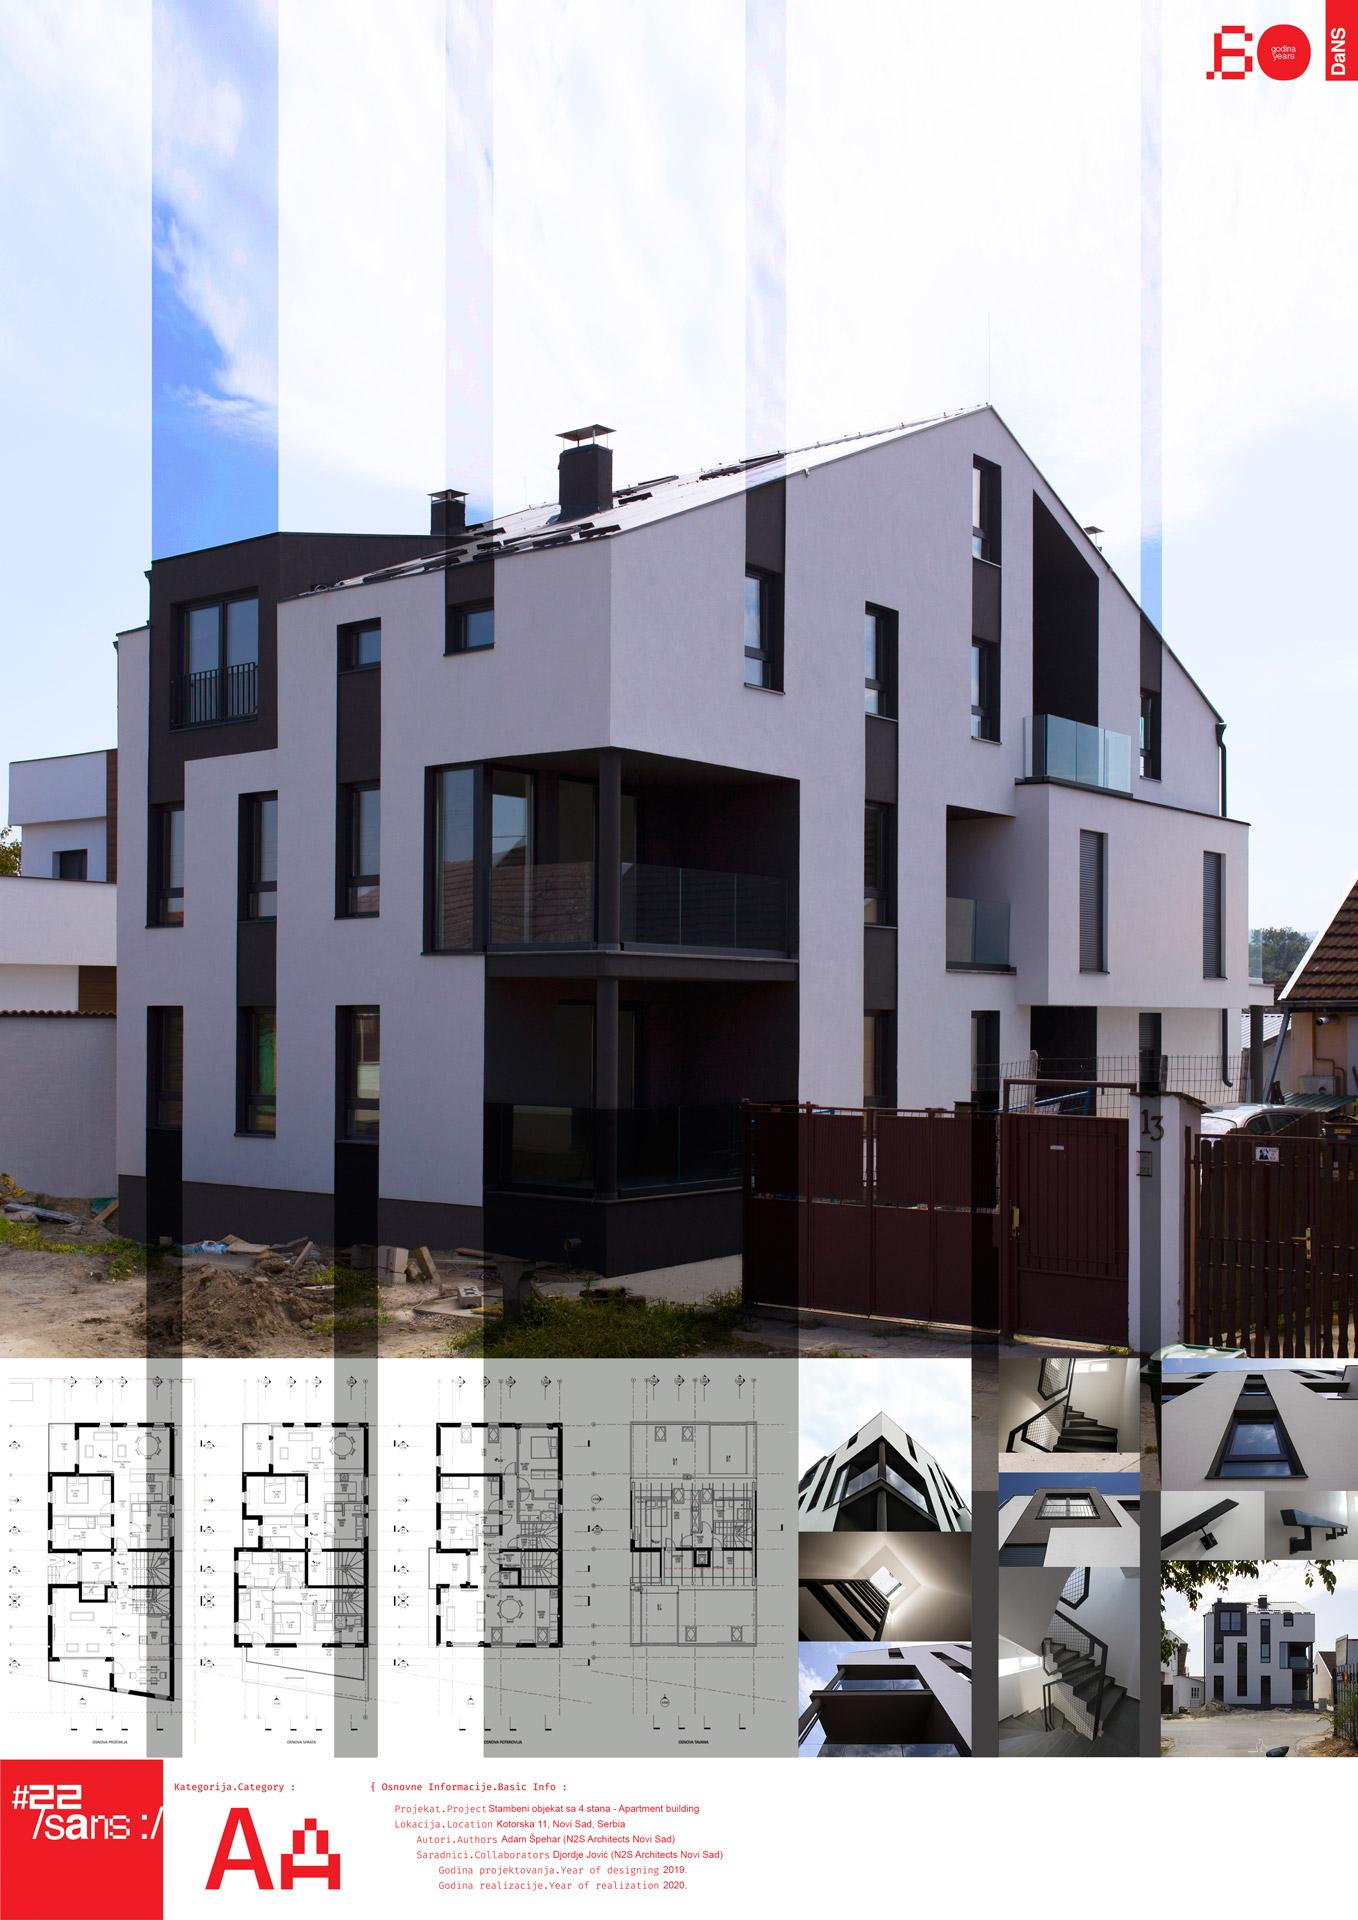 "<p class=""naslov-br"">aa25</p>Stambeni objekat sa 4 stana - 18DOC // Residental Building with 4 Apartments - 18DOC"